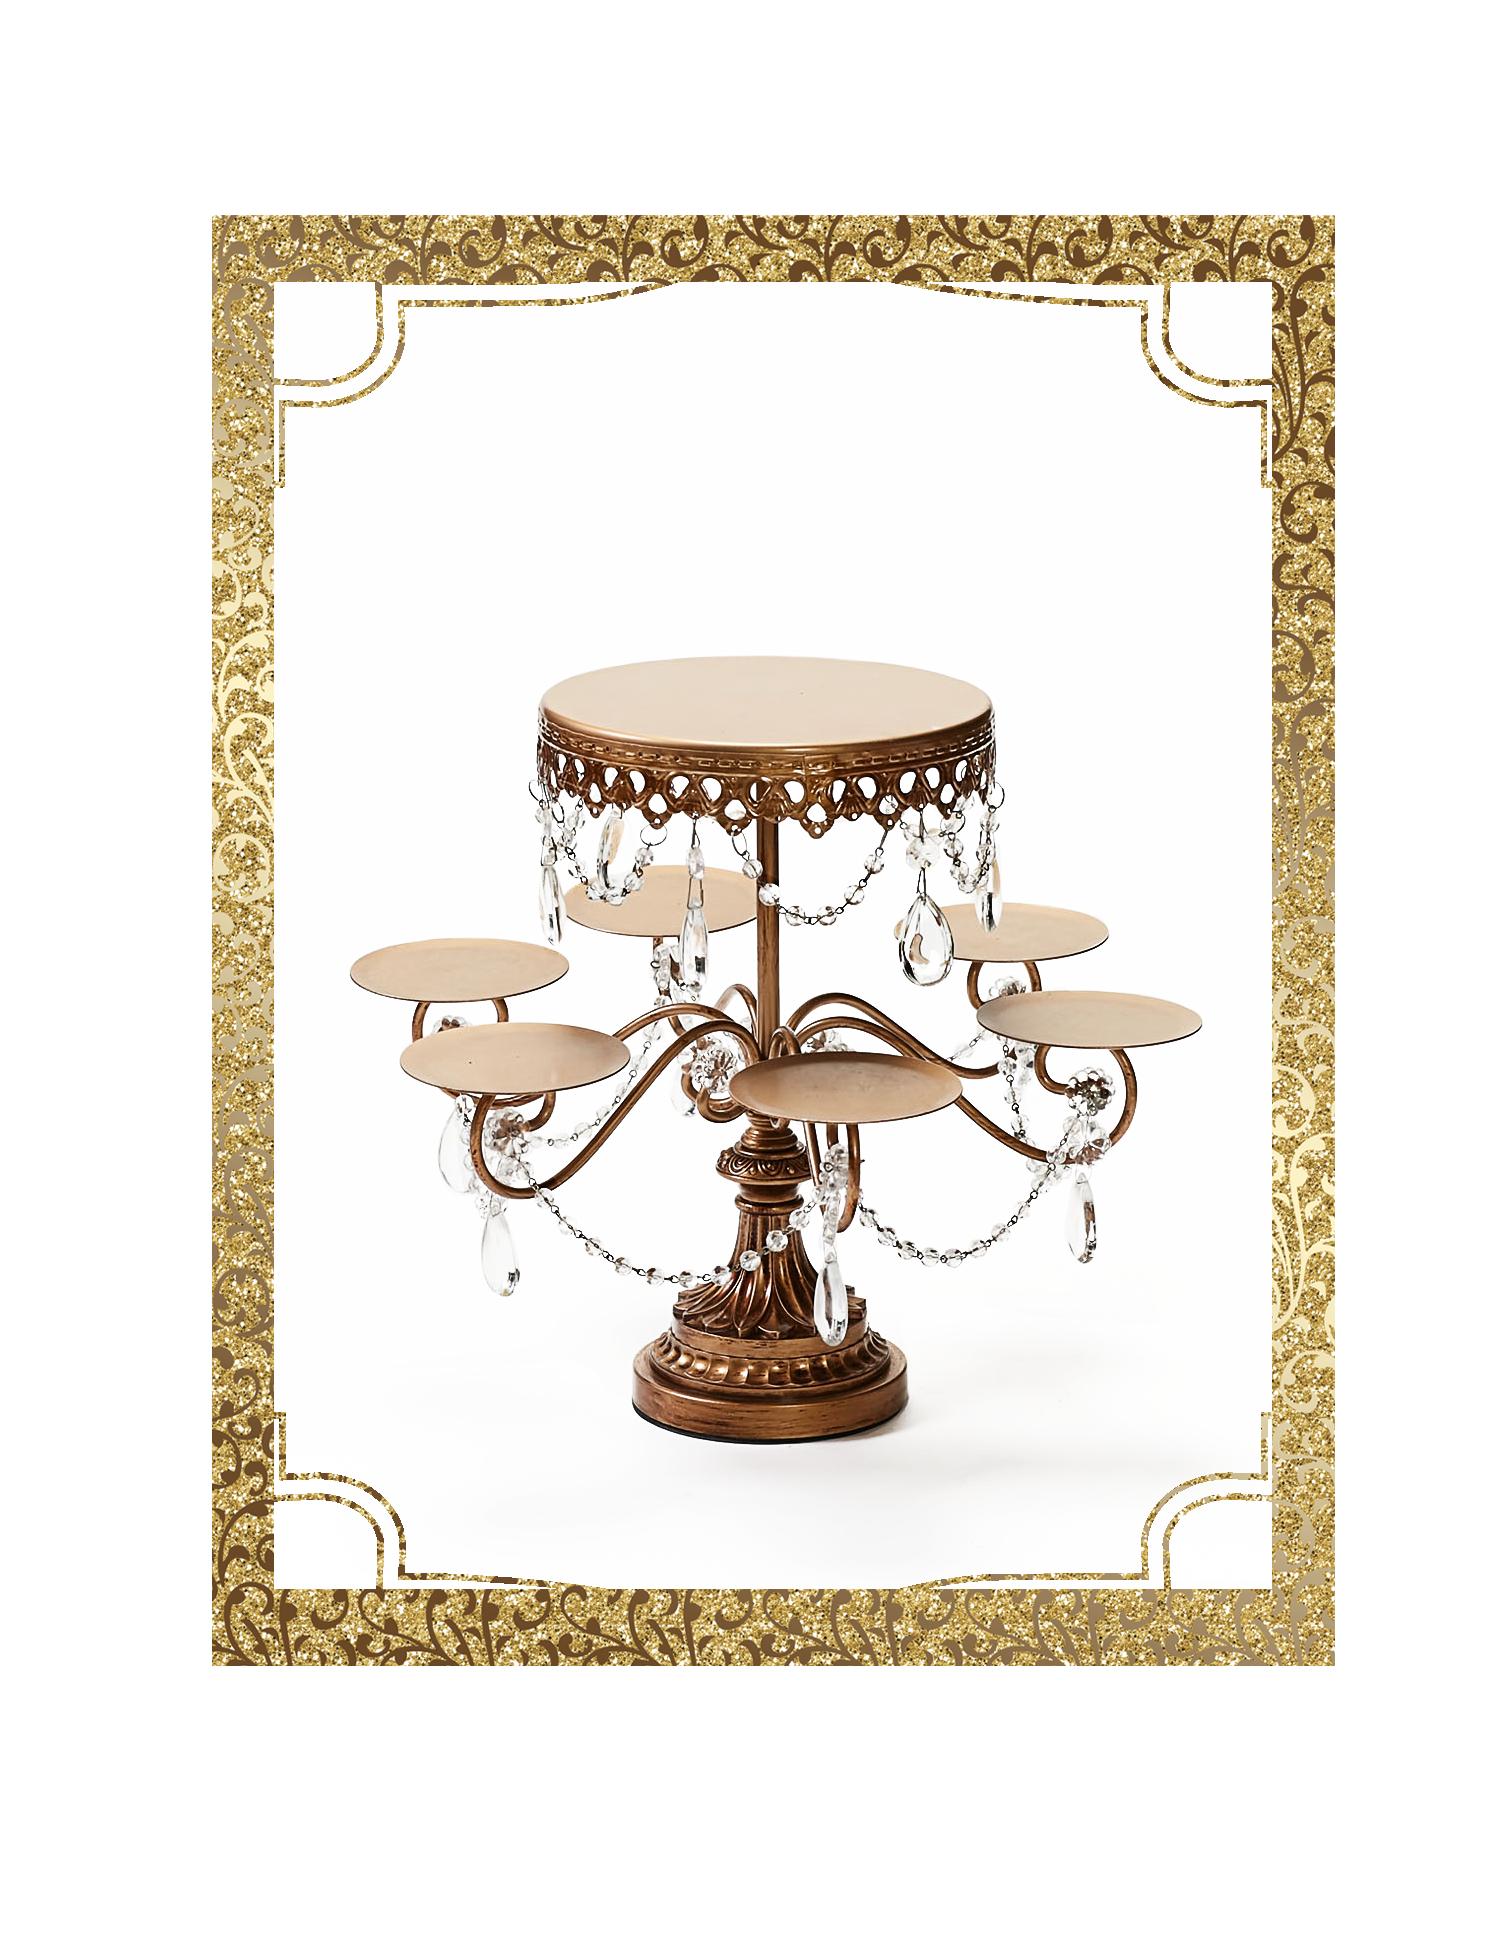 SHOP-preview ANTIQUE GOLD rosebud dessert stand.png